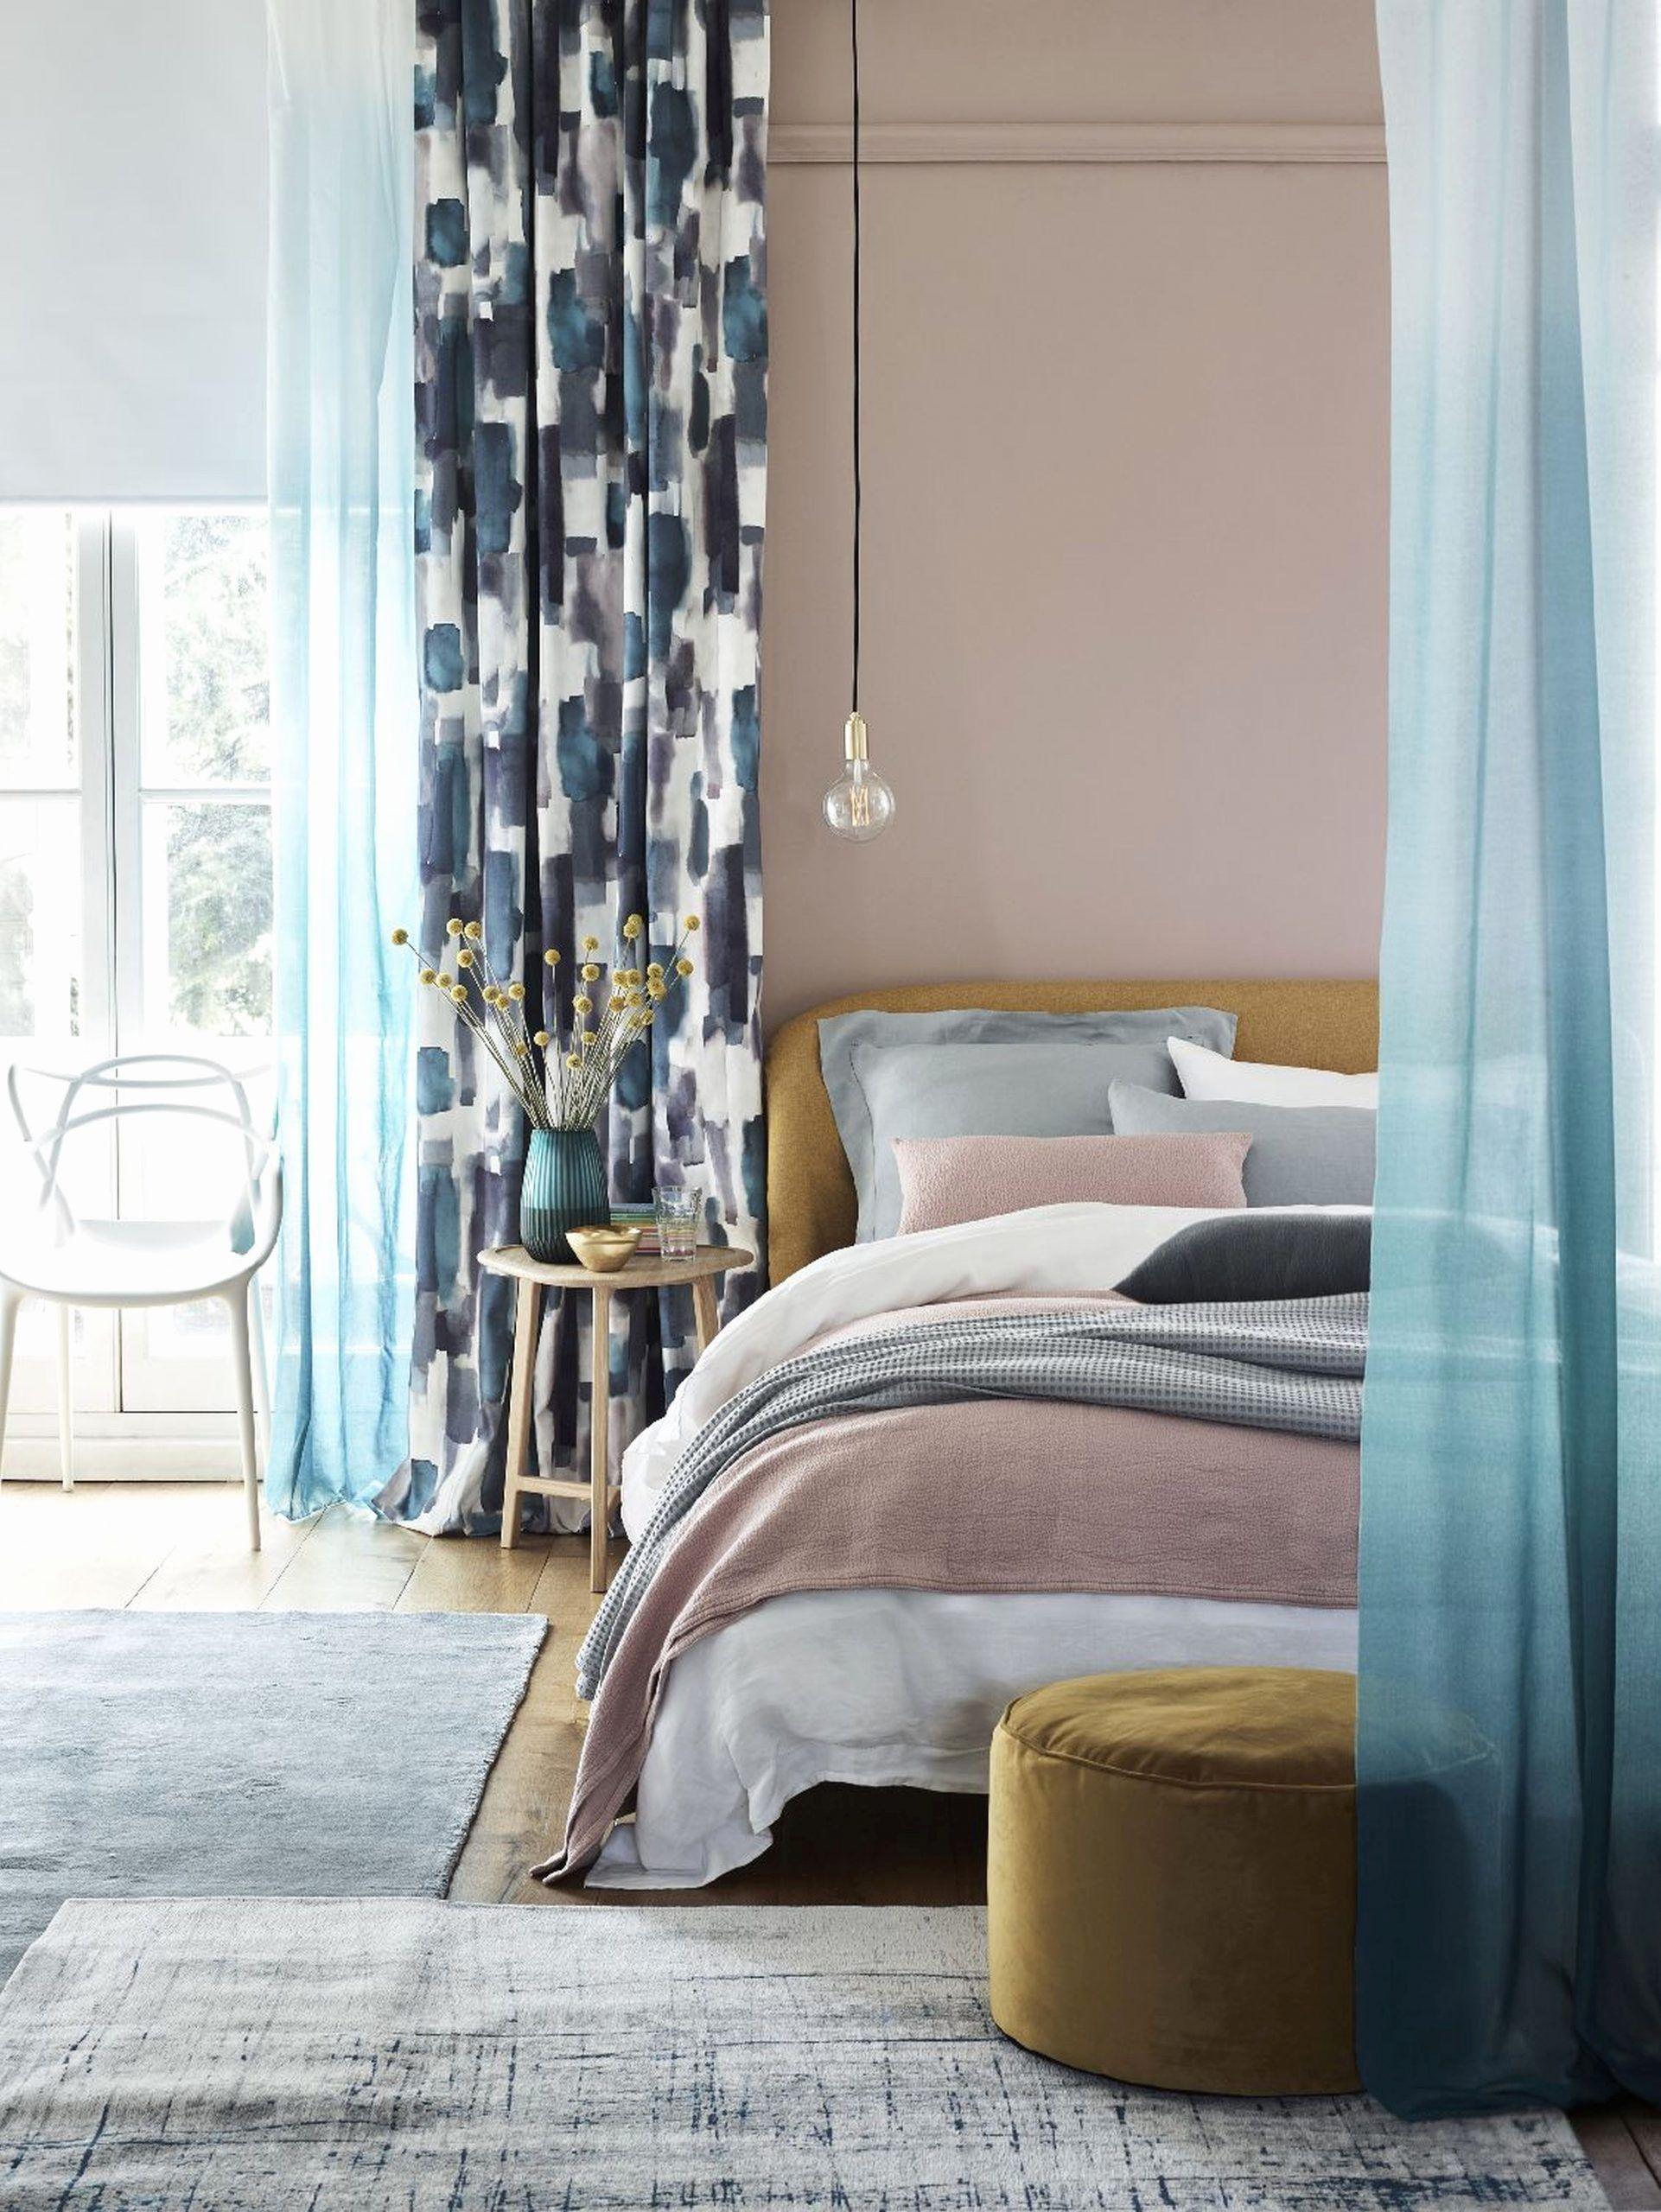 Master Bedroom Curtain Ideas Elegant 16 Stylish Bedroom ... on Master Bedroom Curtain Ideas  id=42014